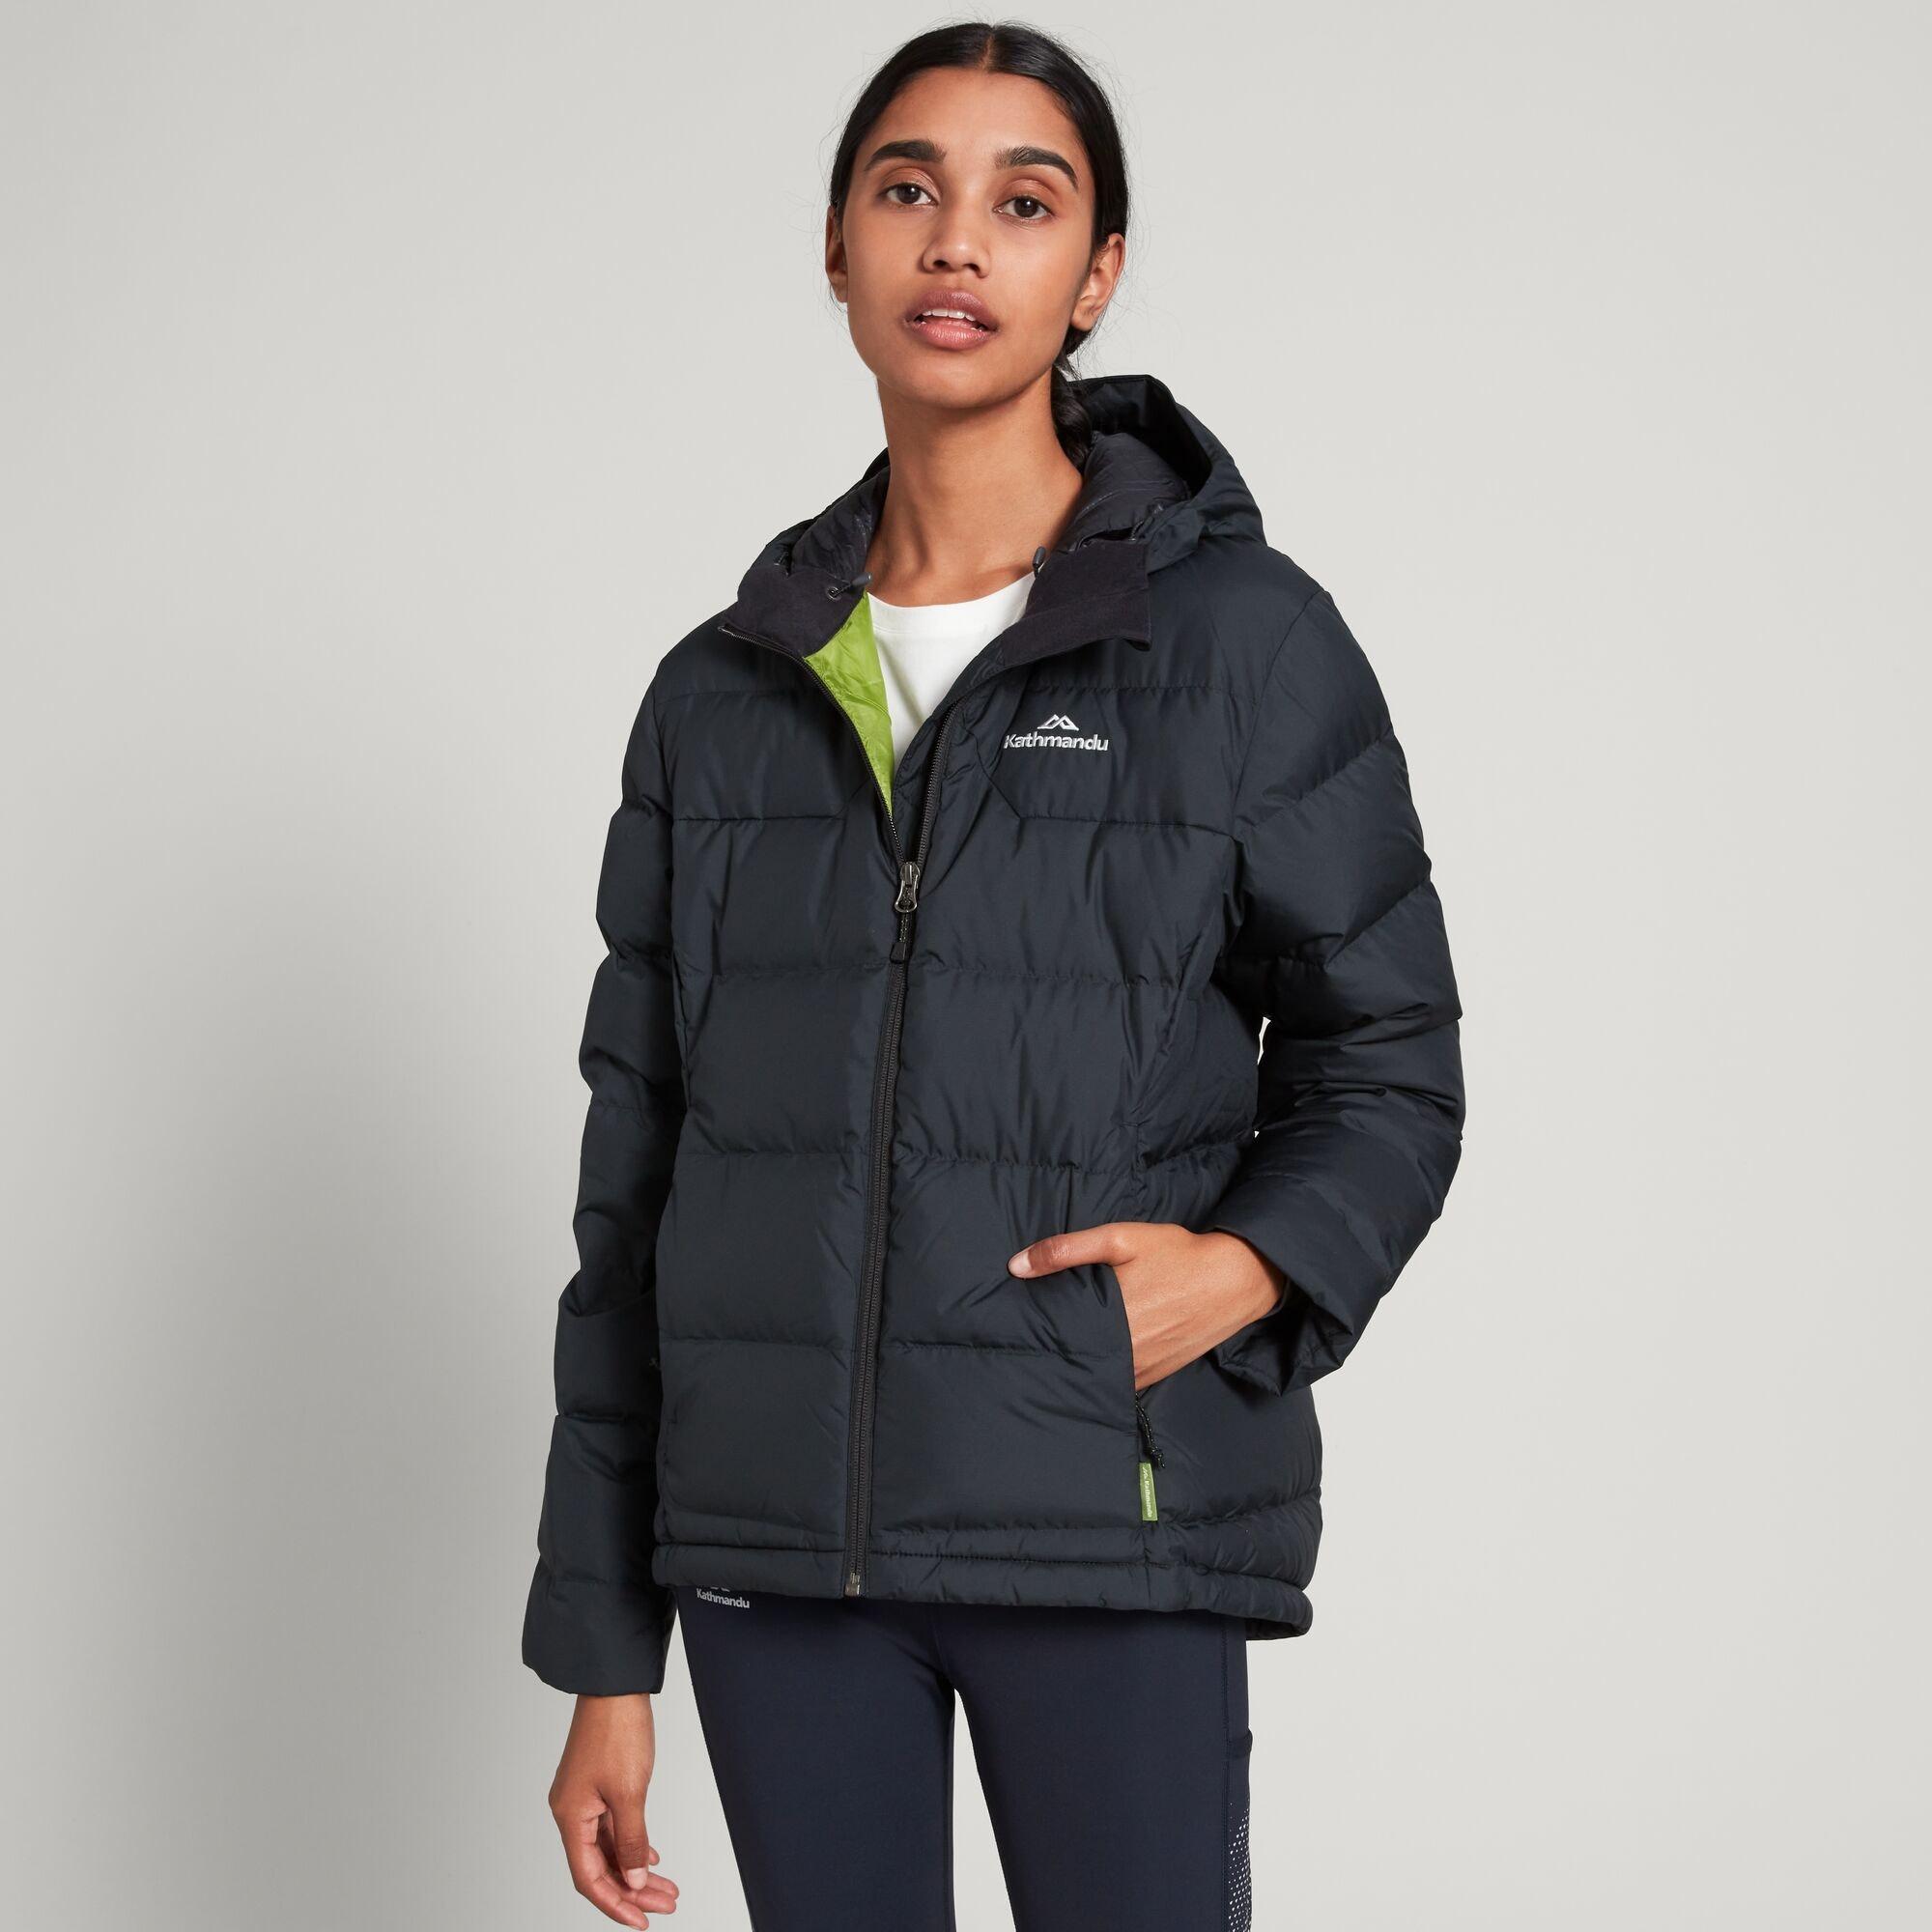 thumbnail 8 - NEW Kathmandu Epiq Womens Hooded Down Puffer 600 Fill Warm Outdoor Winter Jacket